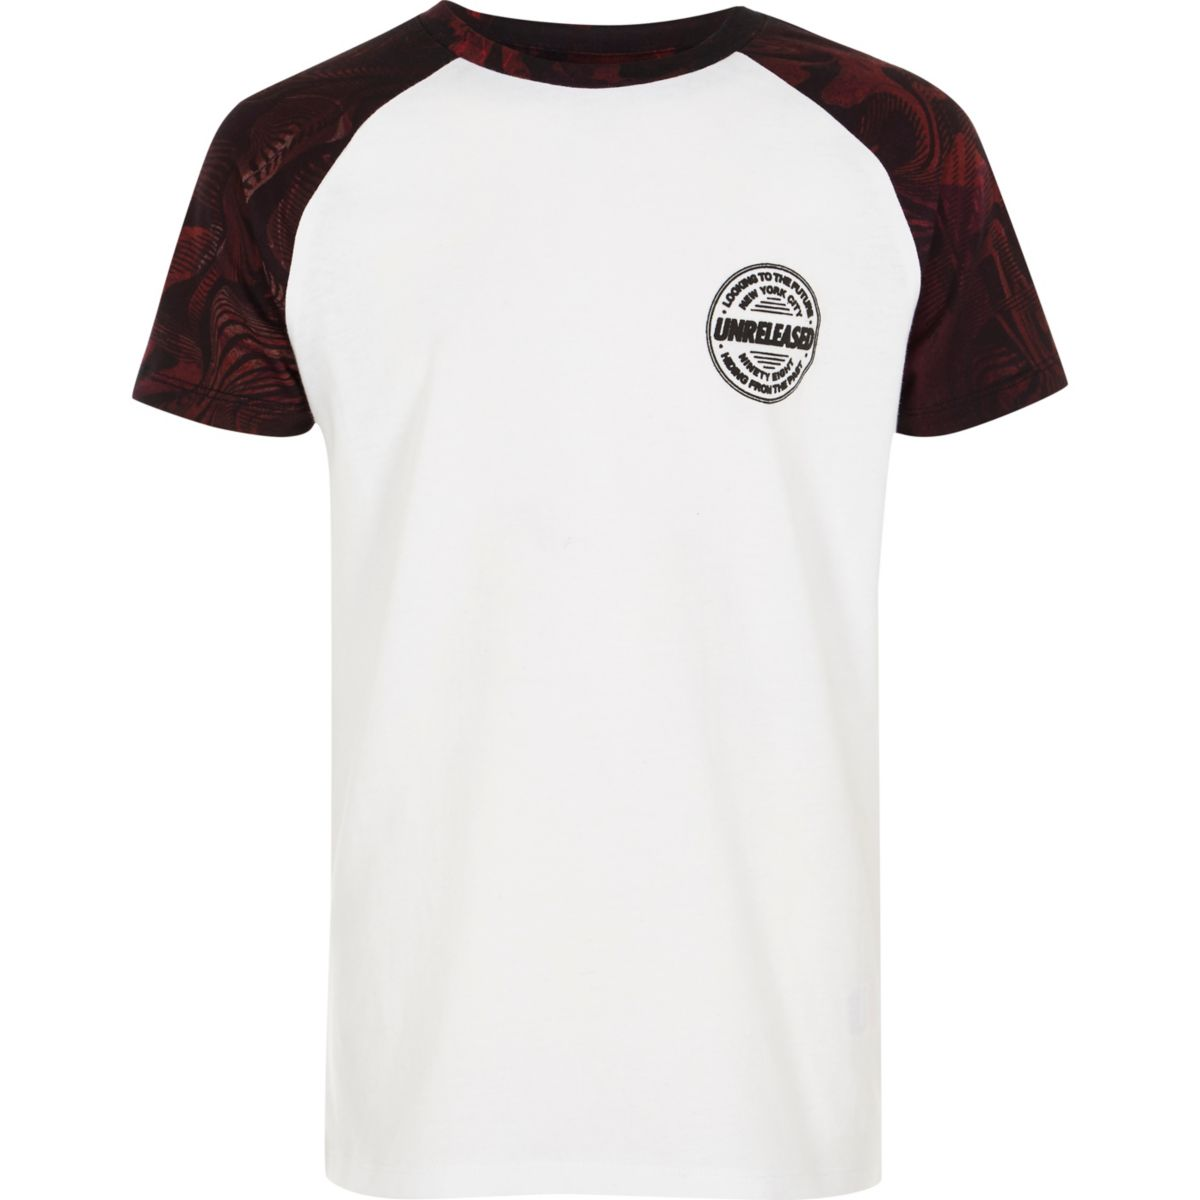 Boys white and red raglan sleeve T-shirt